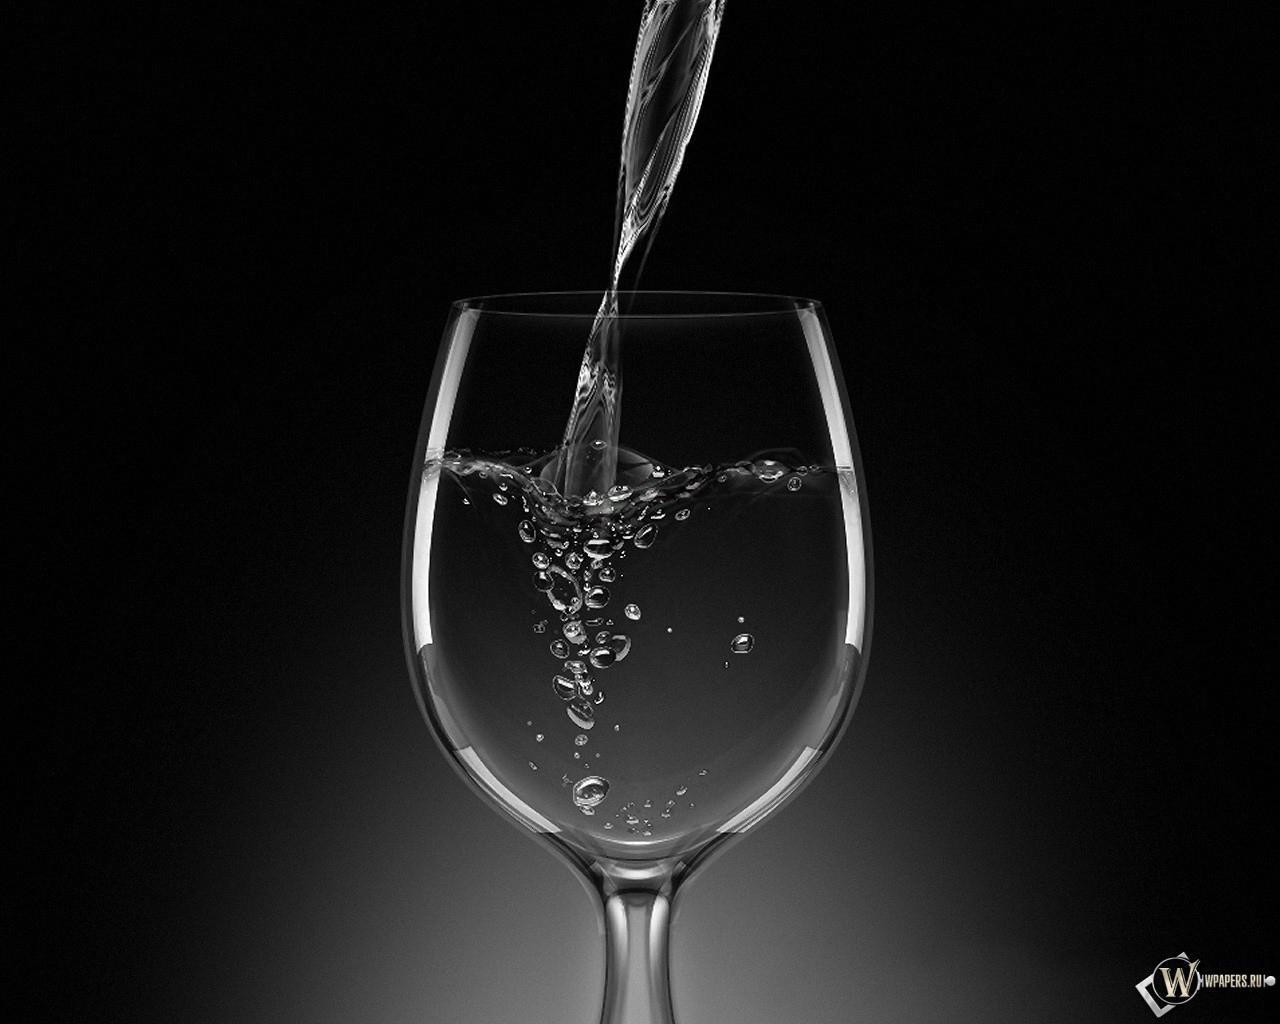 Бокал с шампанским 1280x1024